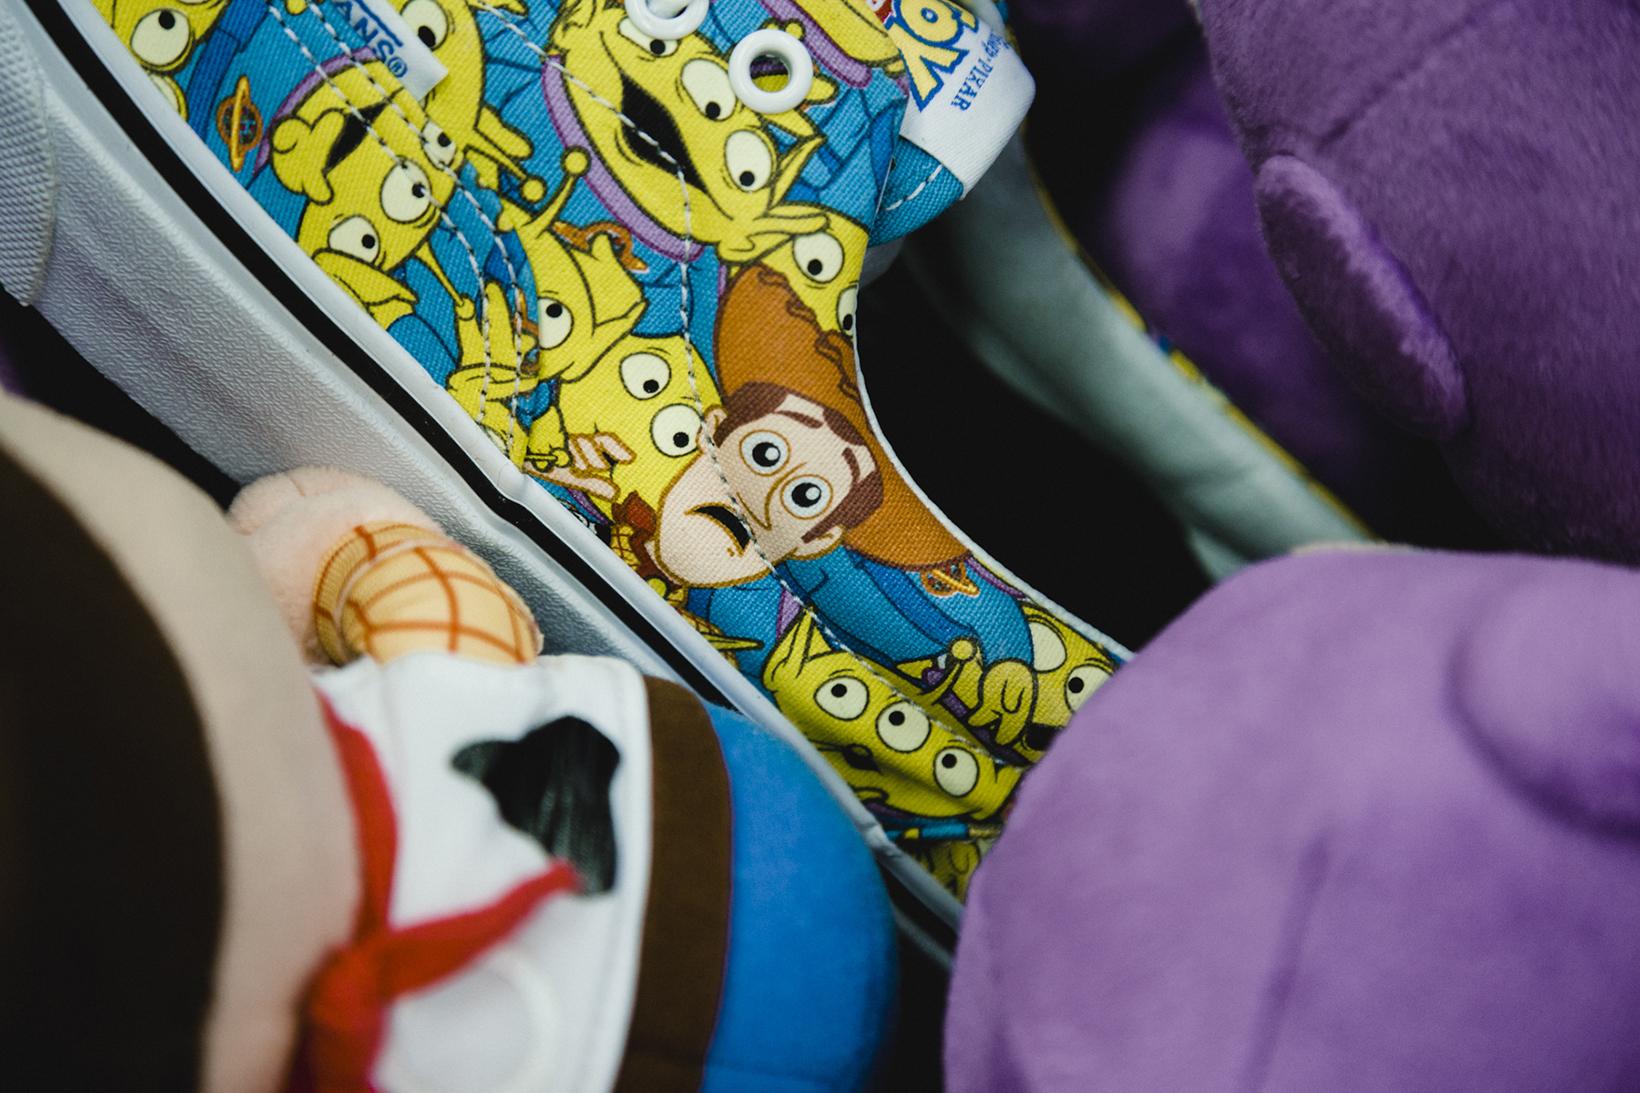 Toy Story Vans Sneakers Woody Buzz Lightyear Disney - 1765023